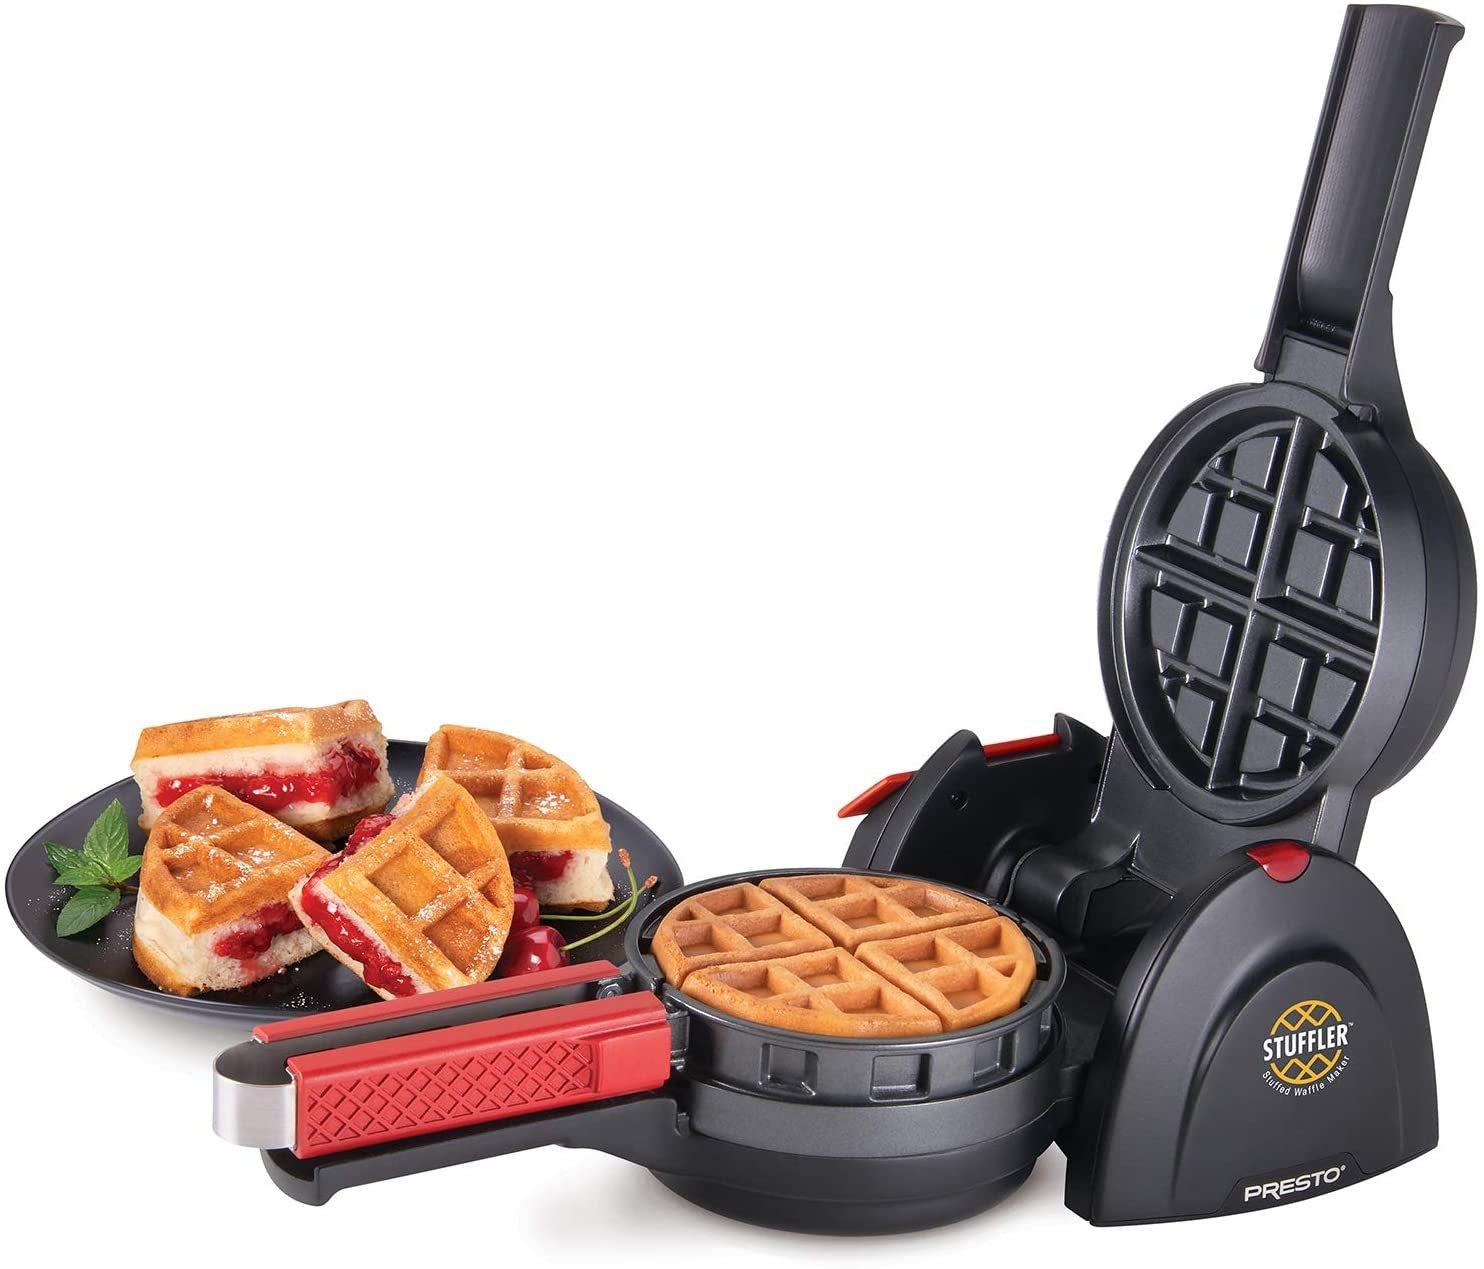 Presto Stuffler Stuffed Waffle Maker